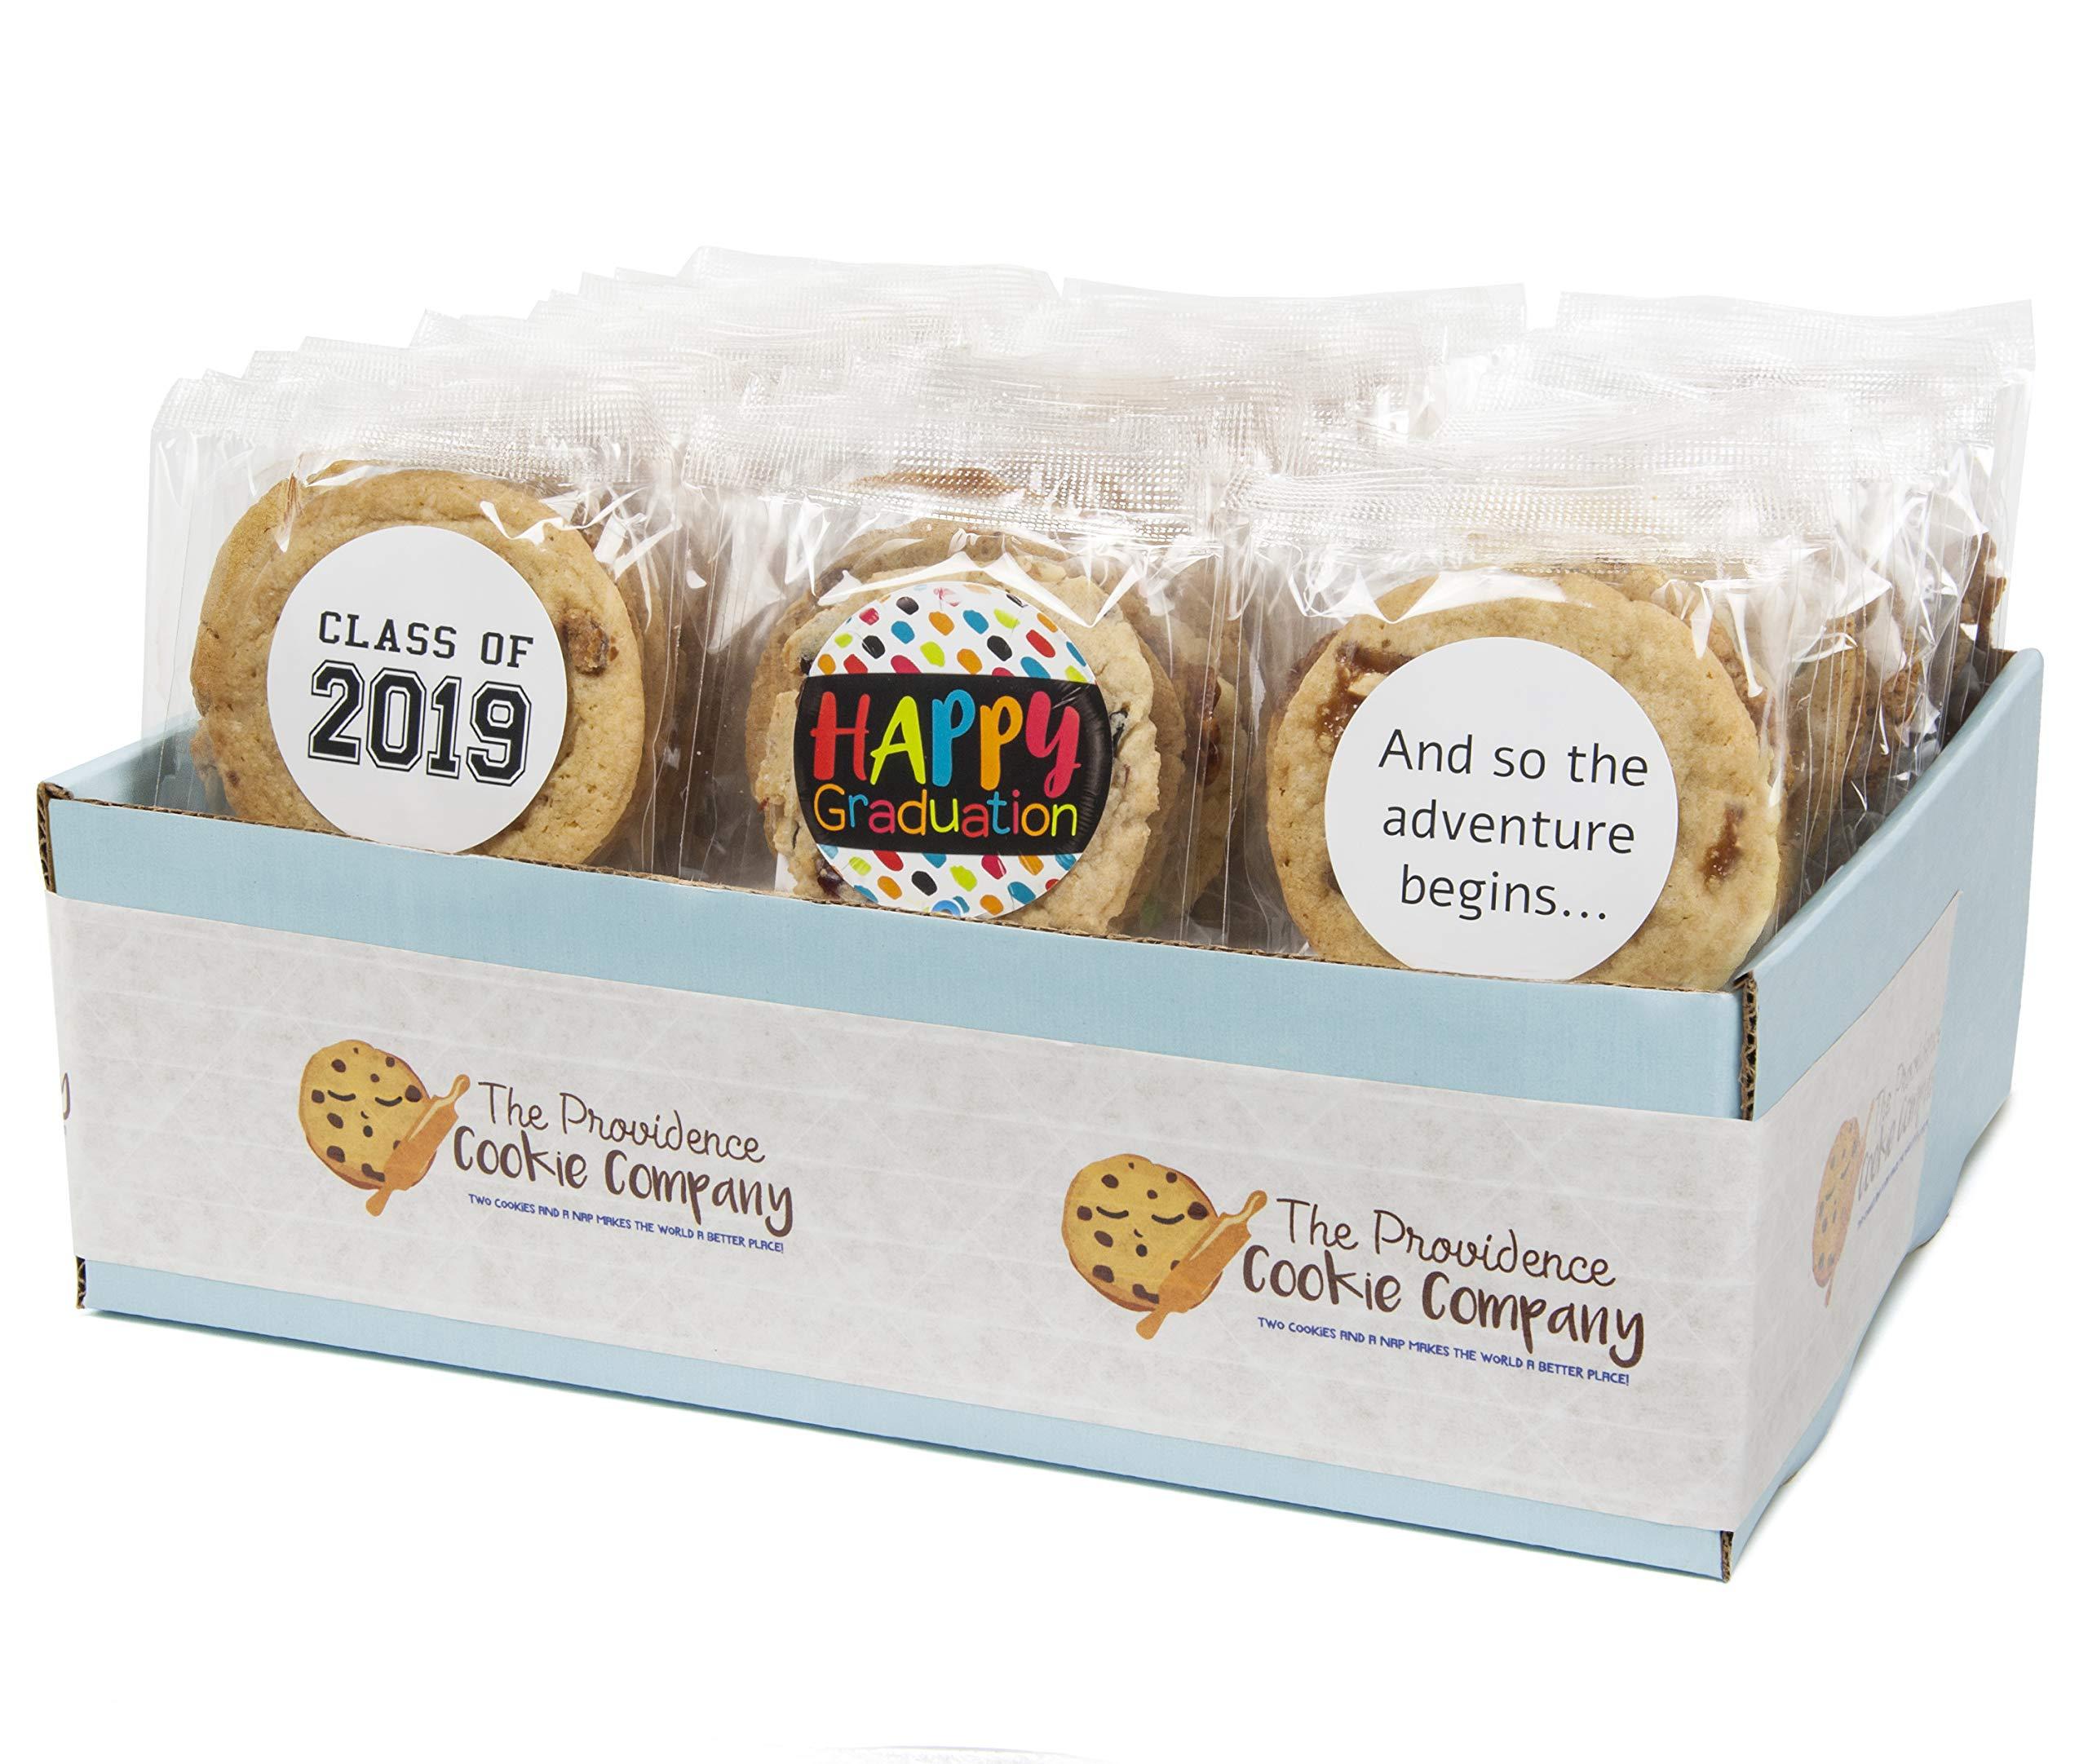 The Providence Cookie Company GRADUATION GOURMET COOKIE GIFT choose 1, 2, 3 or 4 Dozen (1 Dozen)